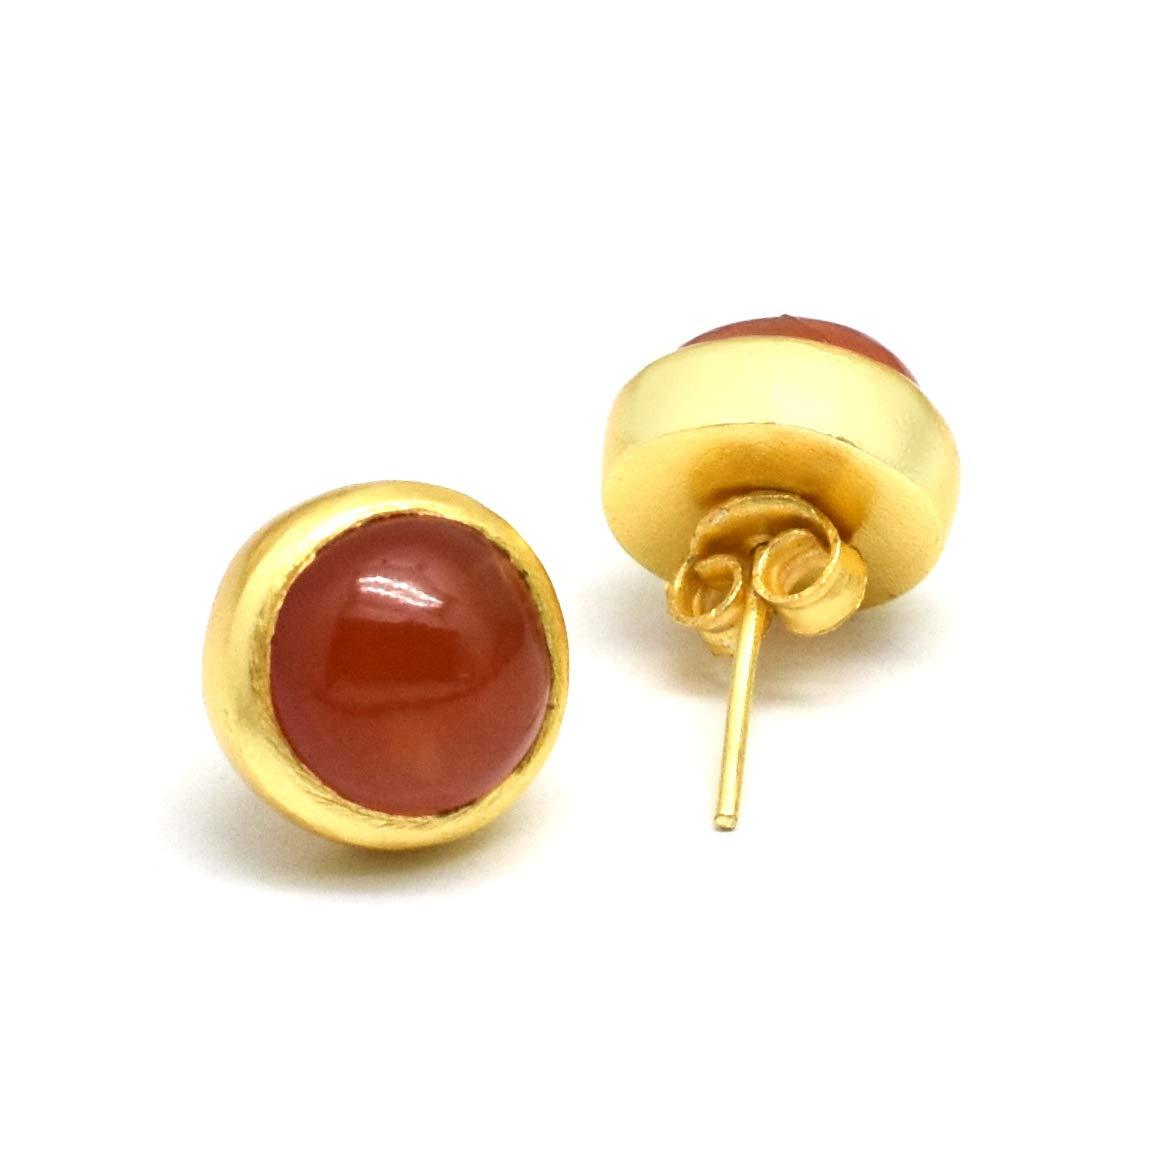 The V Collection earrings 22k gold plated carnelian handmade stud earrings